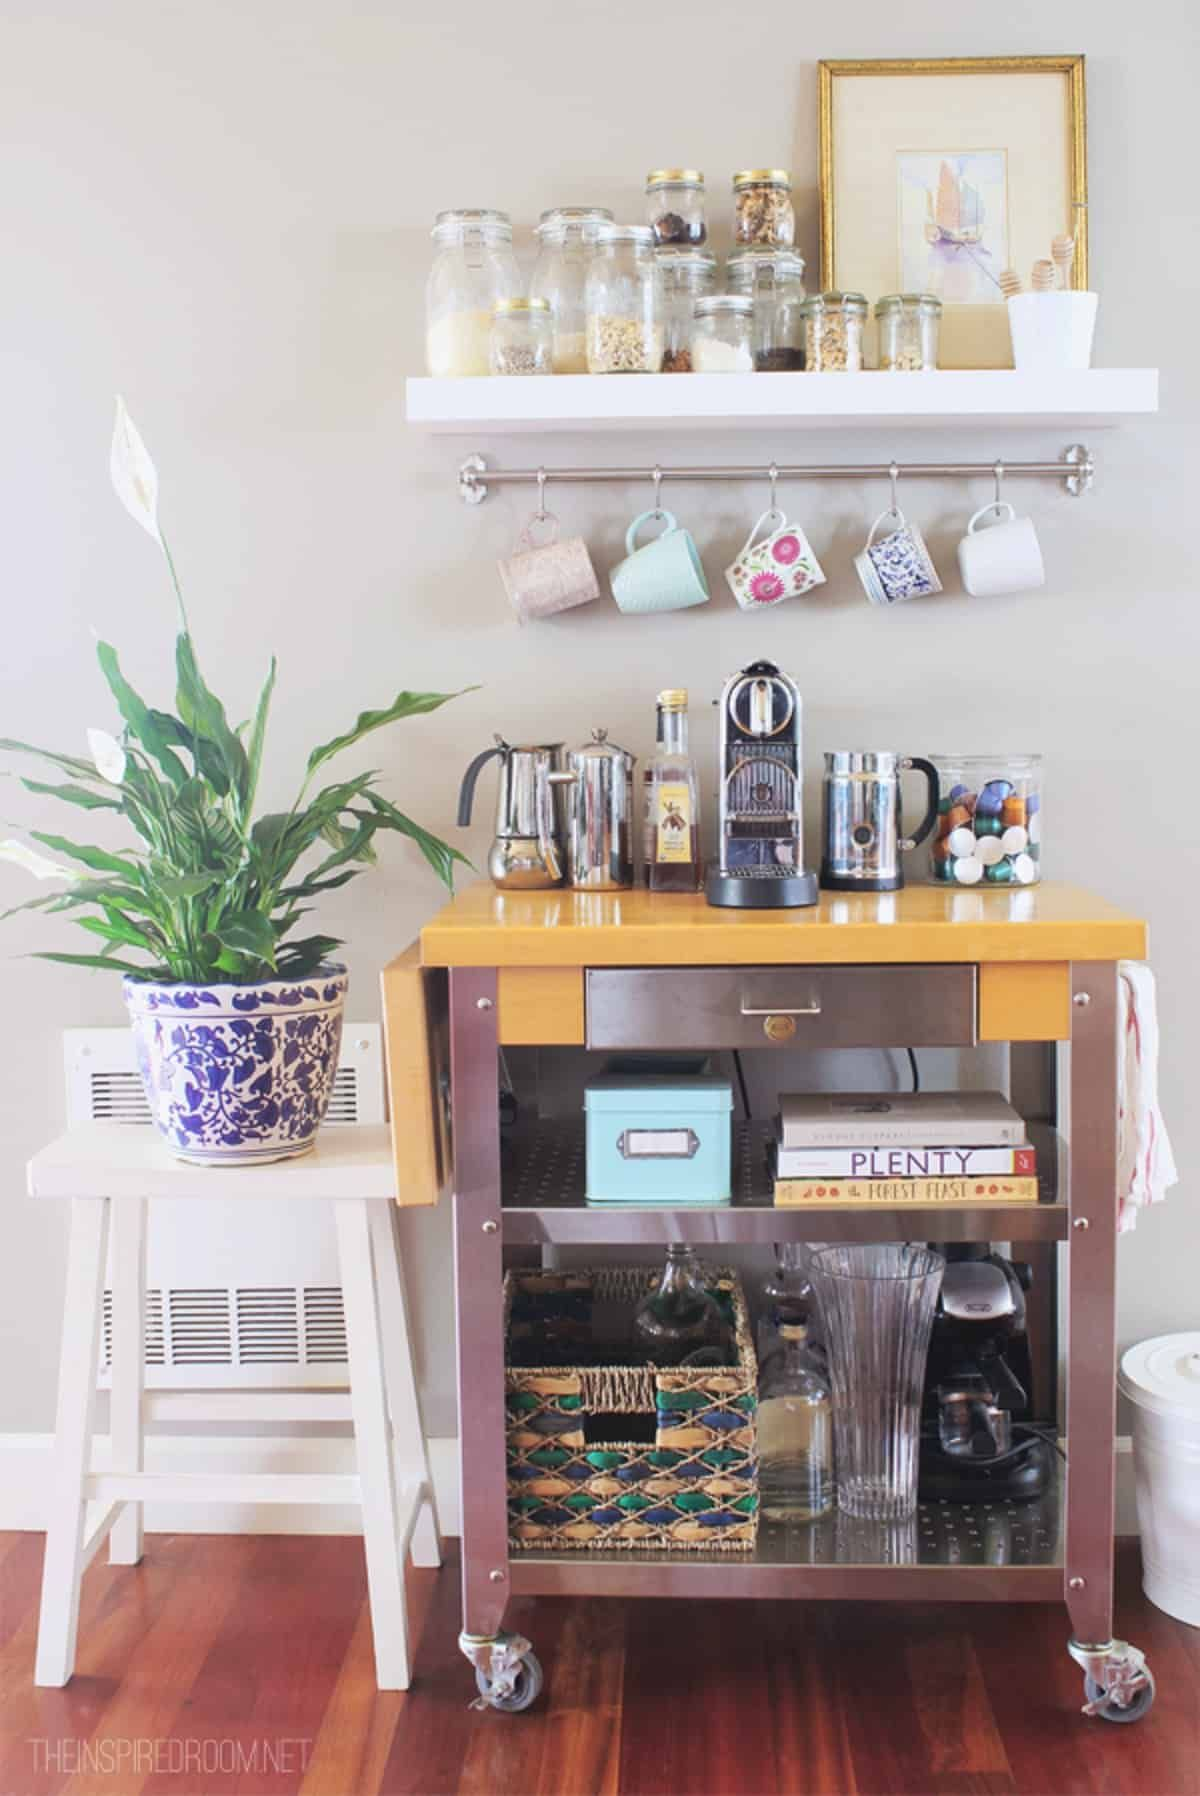 Unique Coffee Cart with White Shelf CoffeeStationIdeas